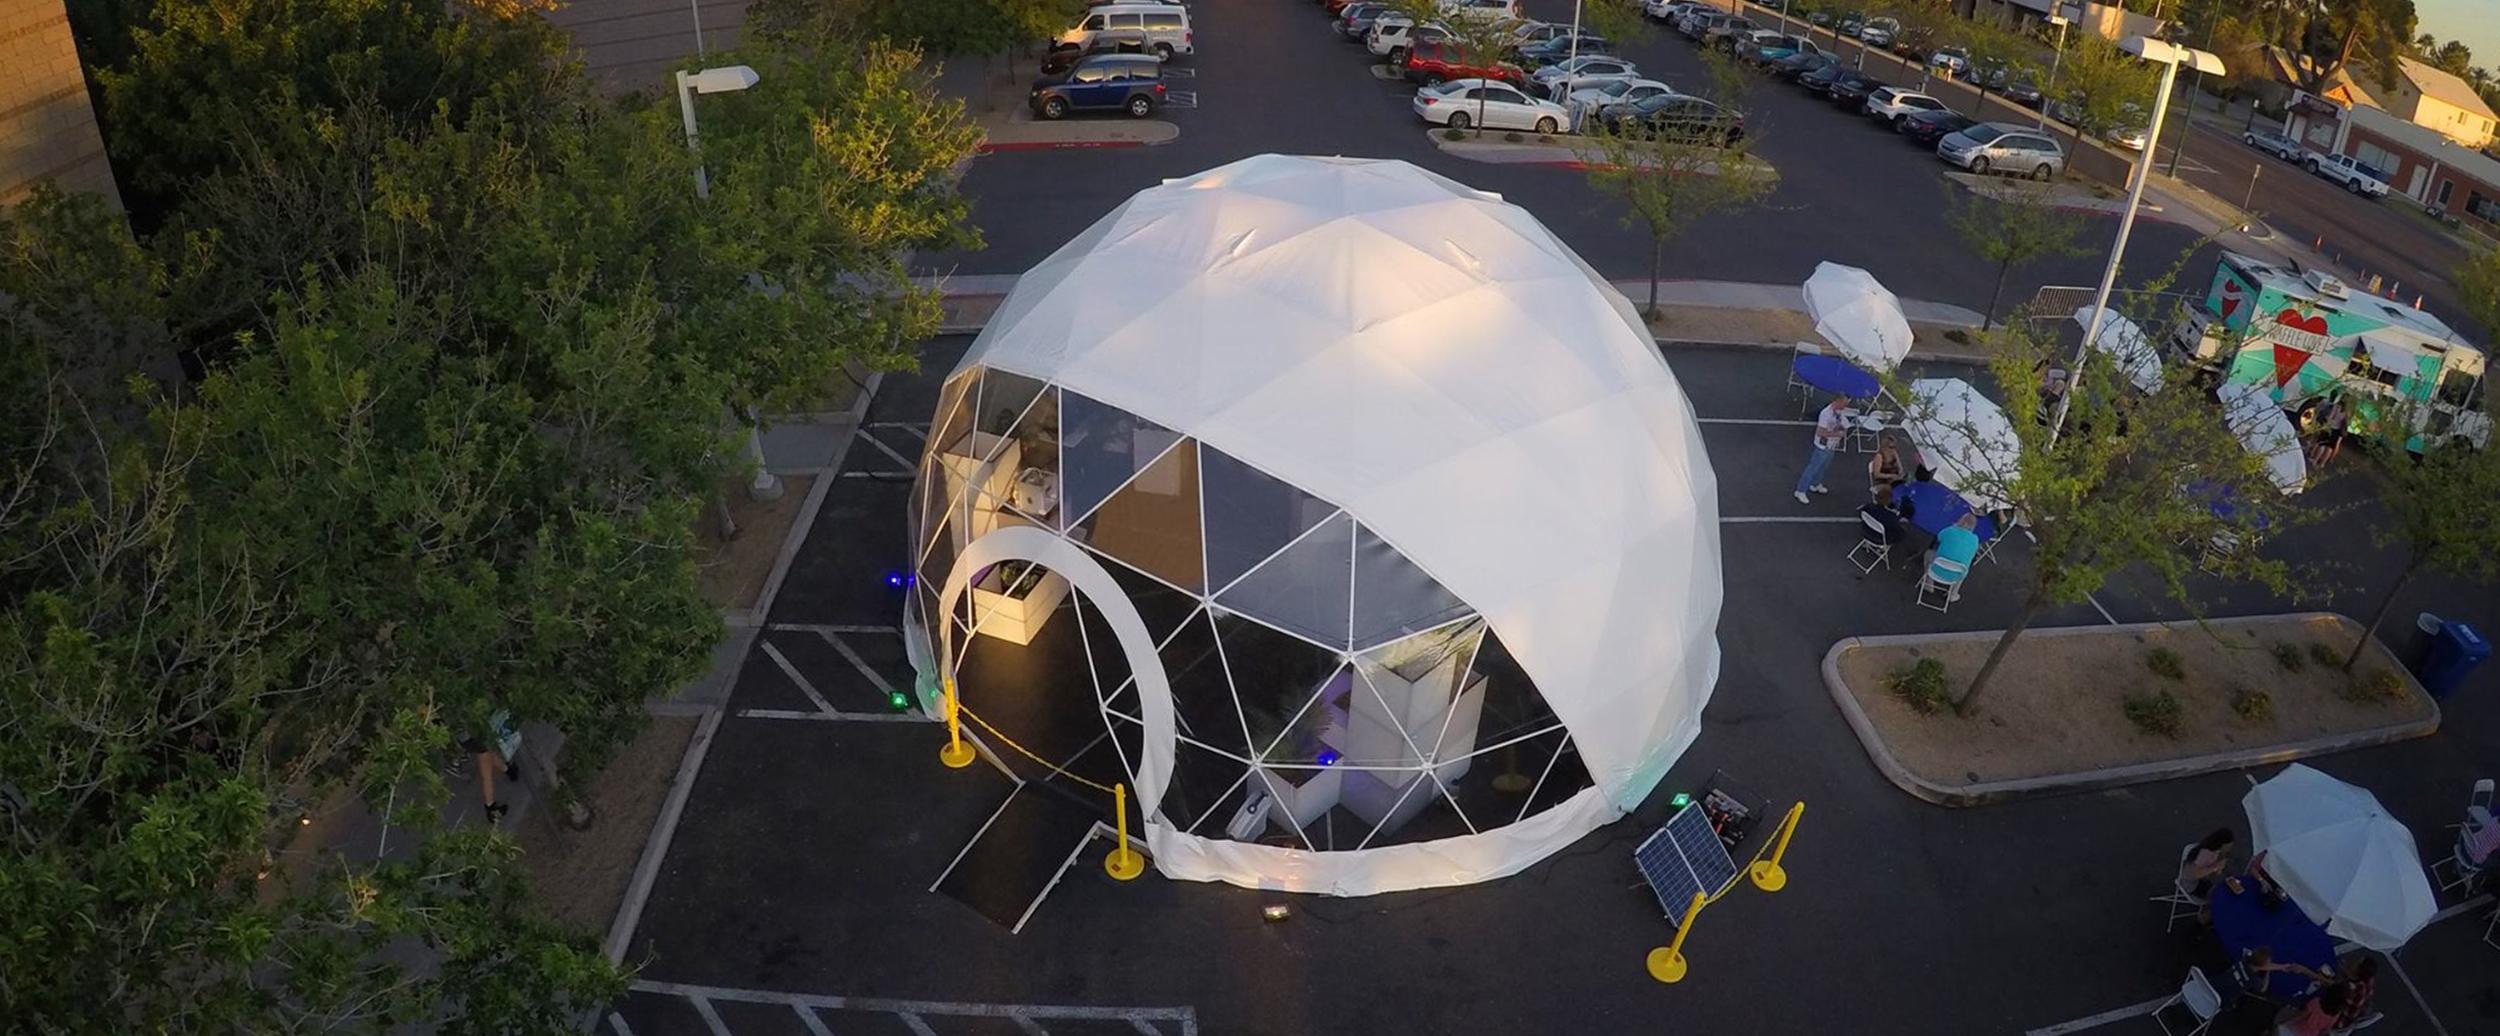 Steel geodesic doime rental company bellingham seattle washington sensebellum structure tent.jpg